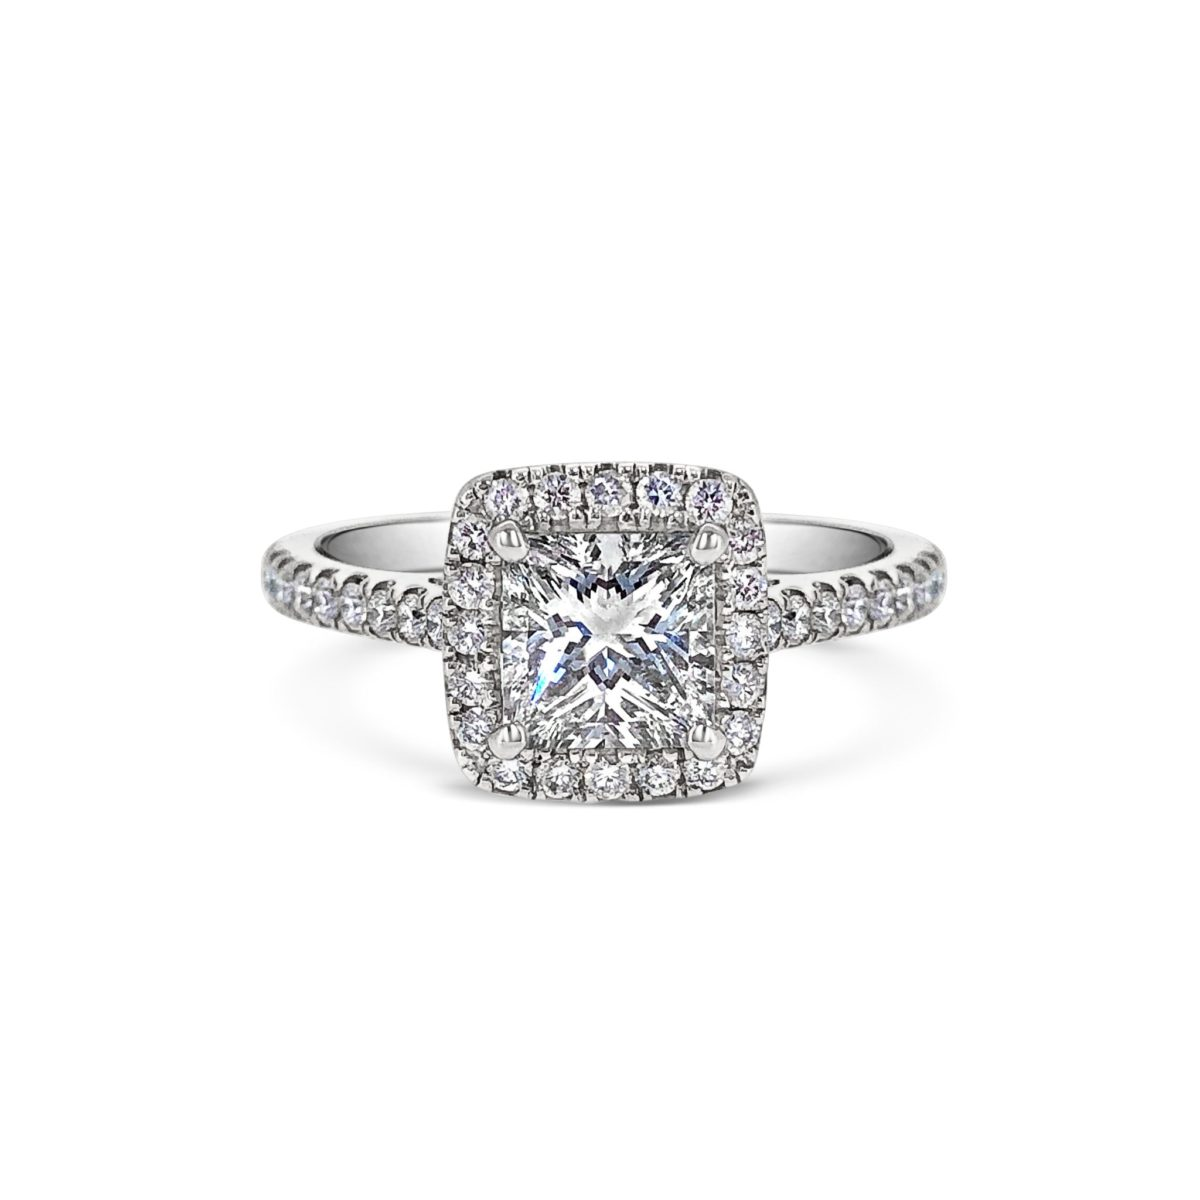 Alise Princess Cut Diamond Halo Microset Engagement Ring